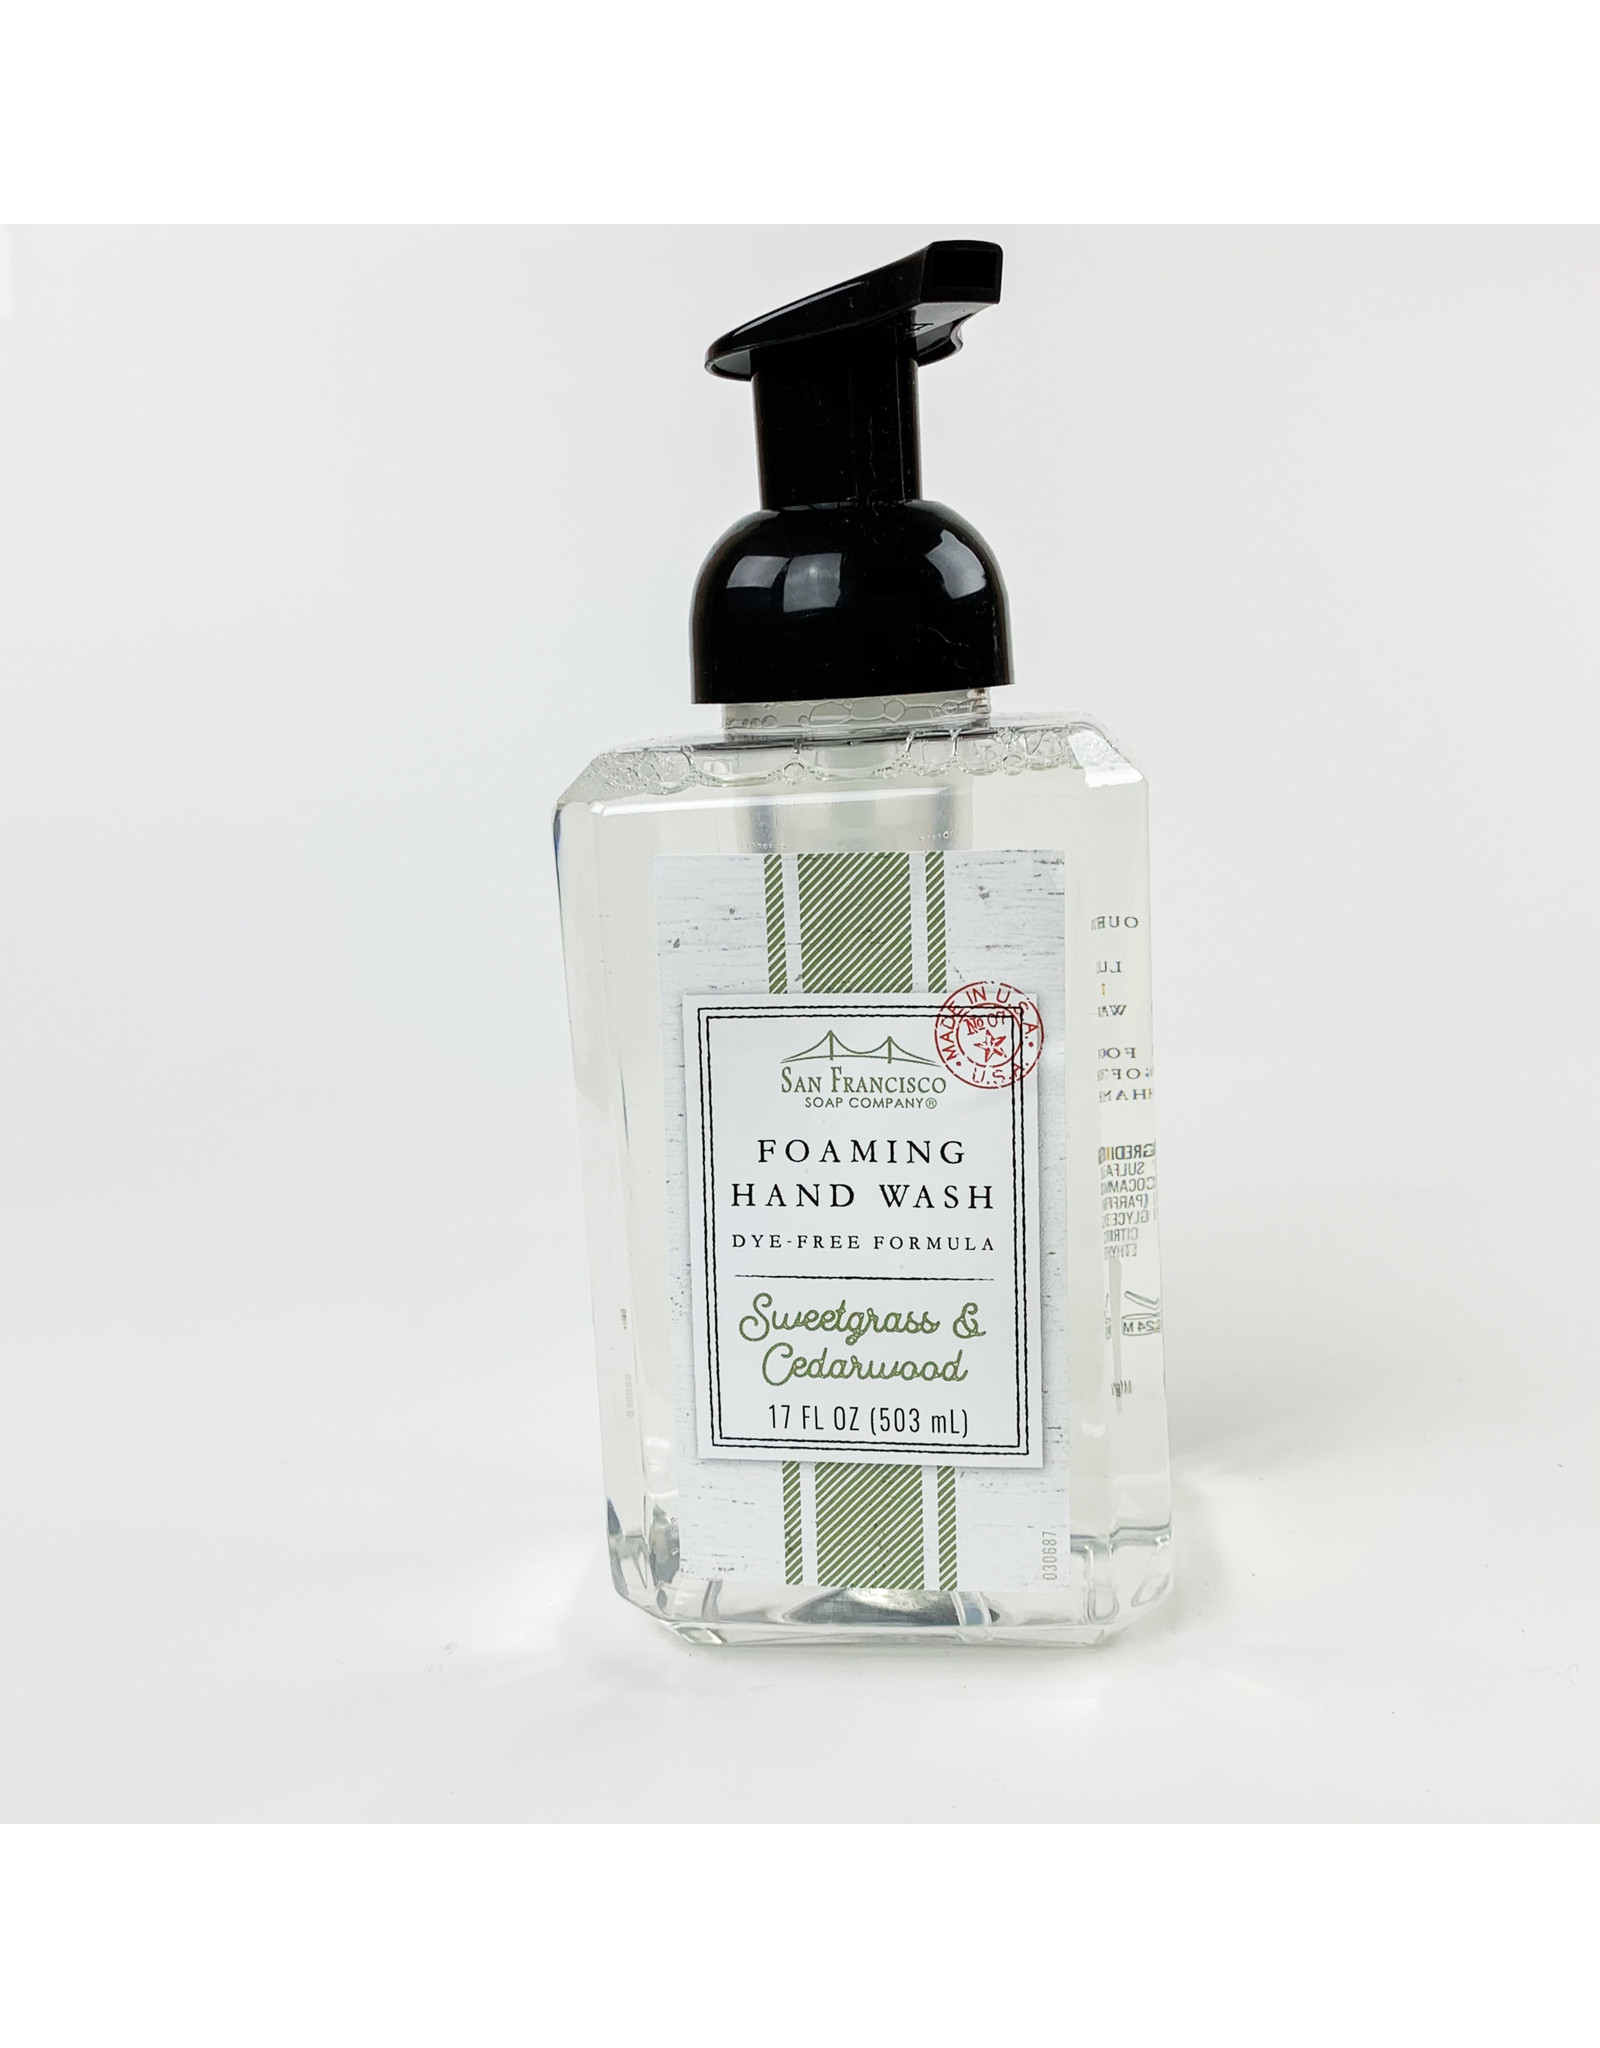 Sweet Grass and Cedar woof Foaming Soap